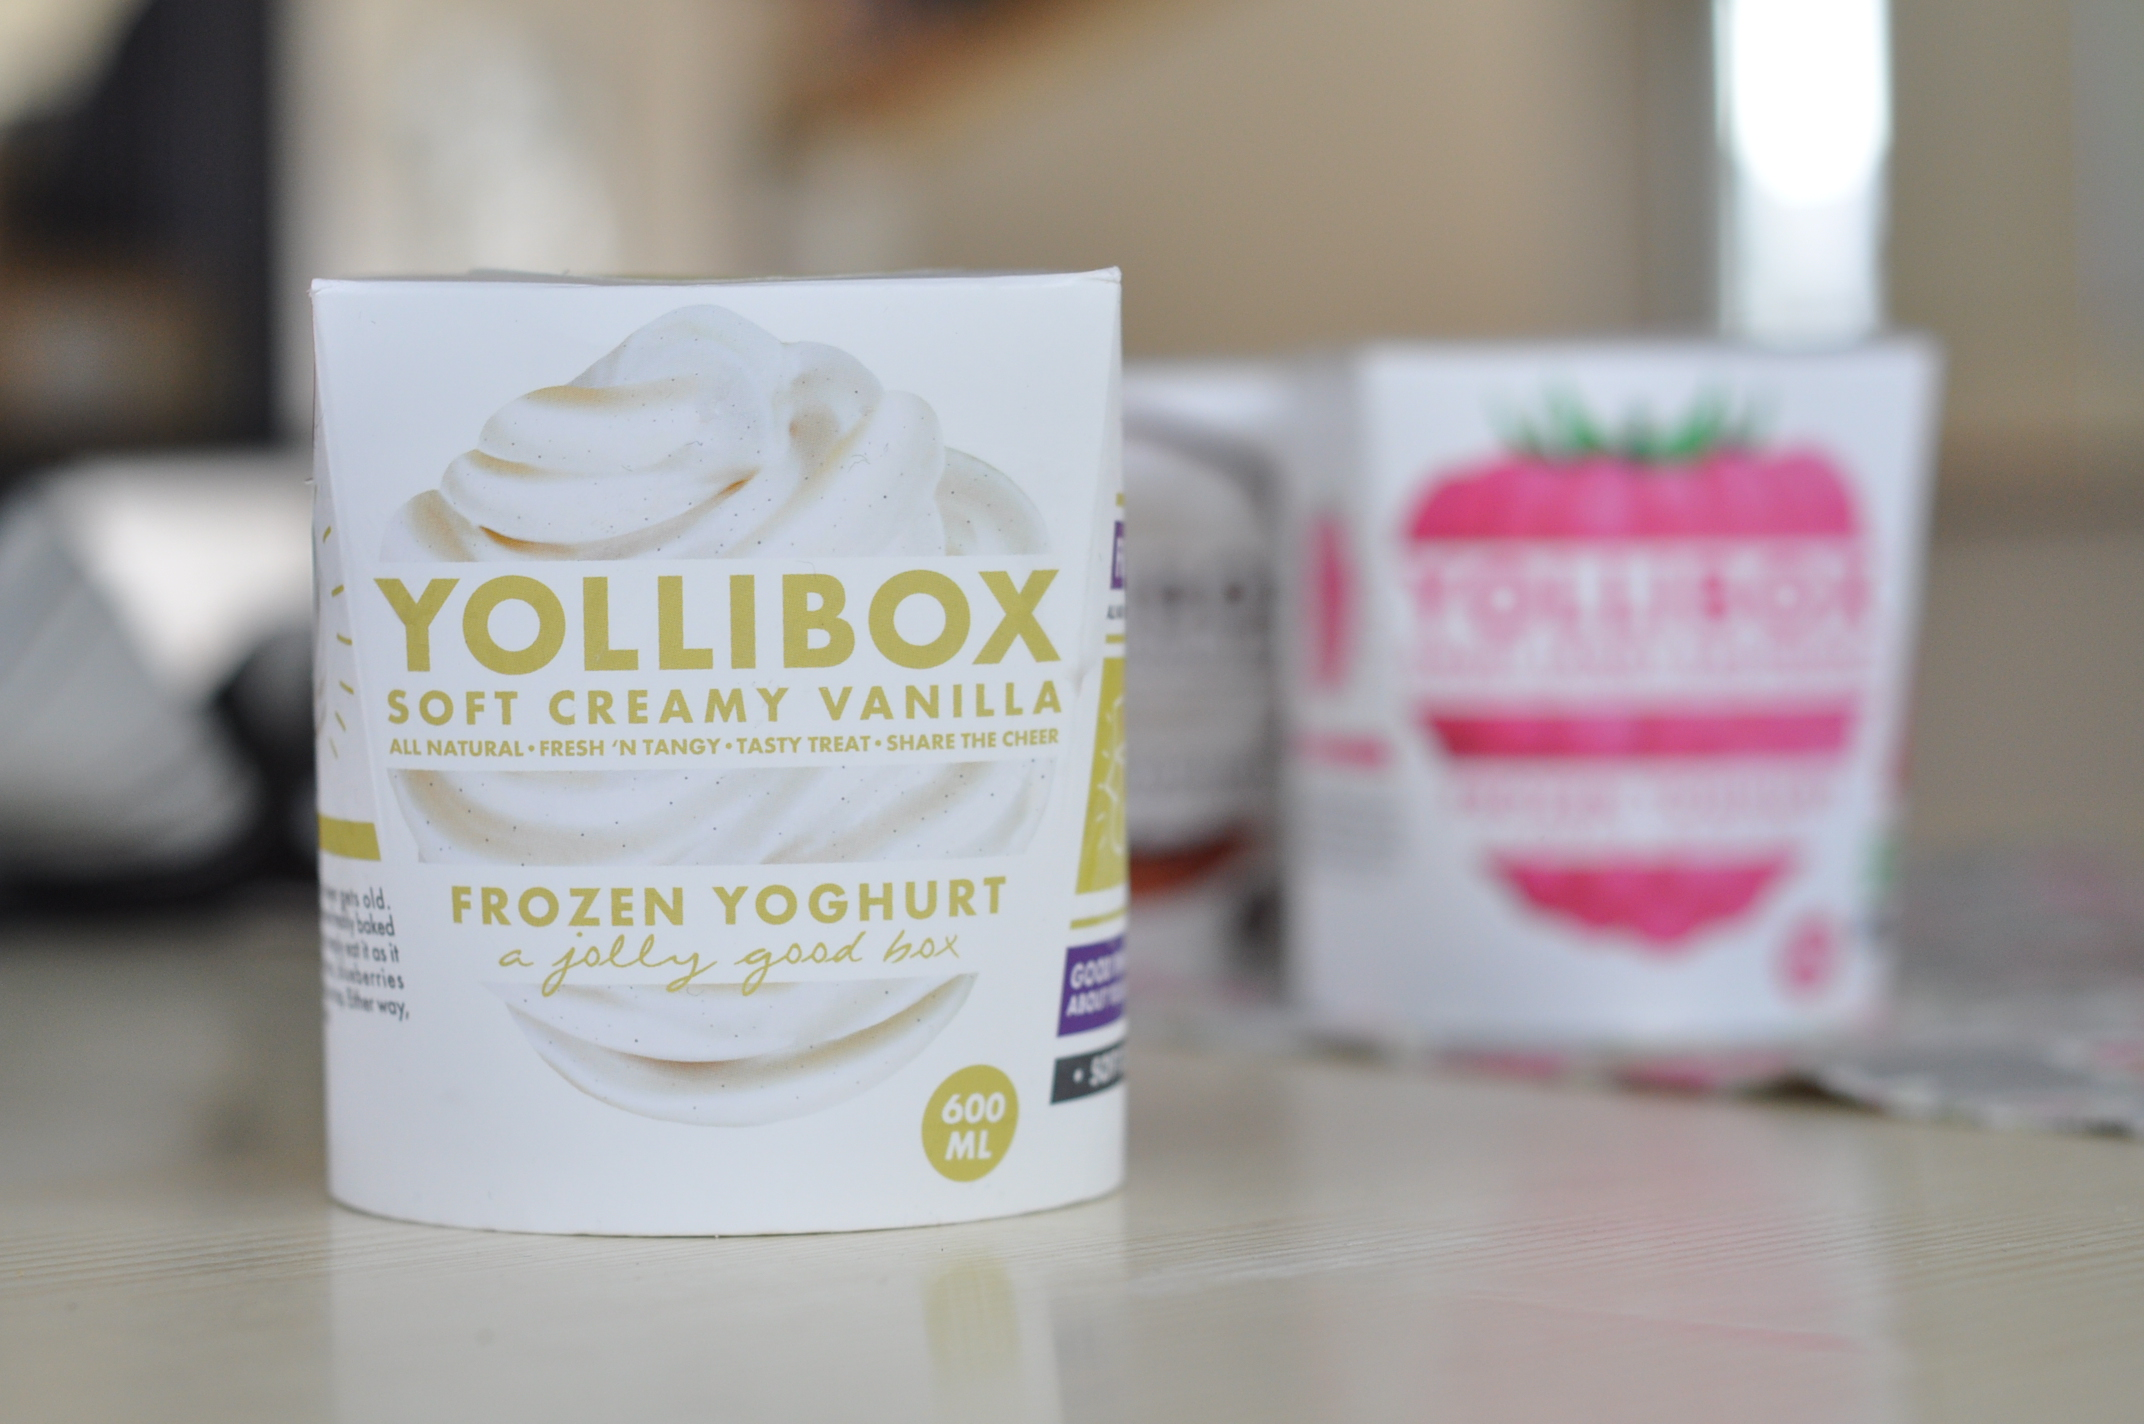 Yollibox Soft Creamy Vanilla